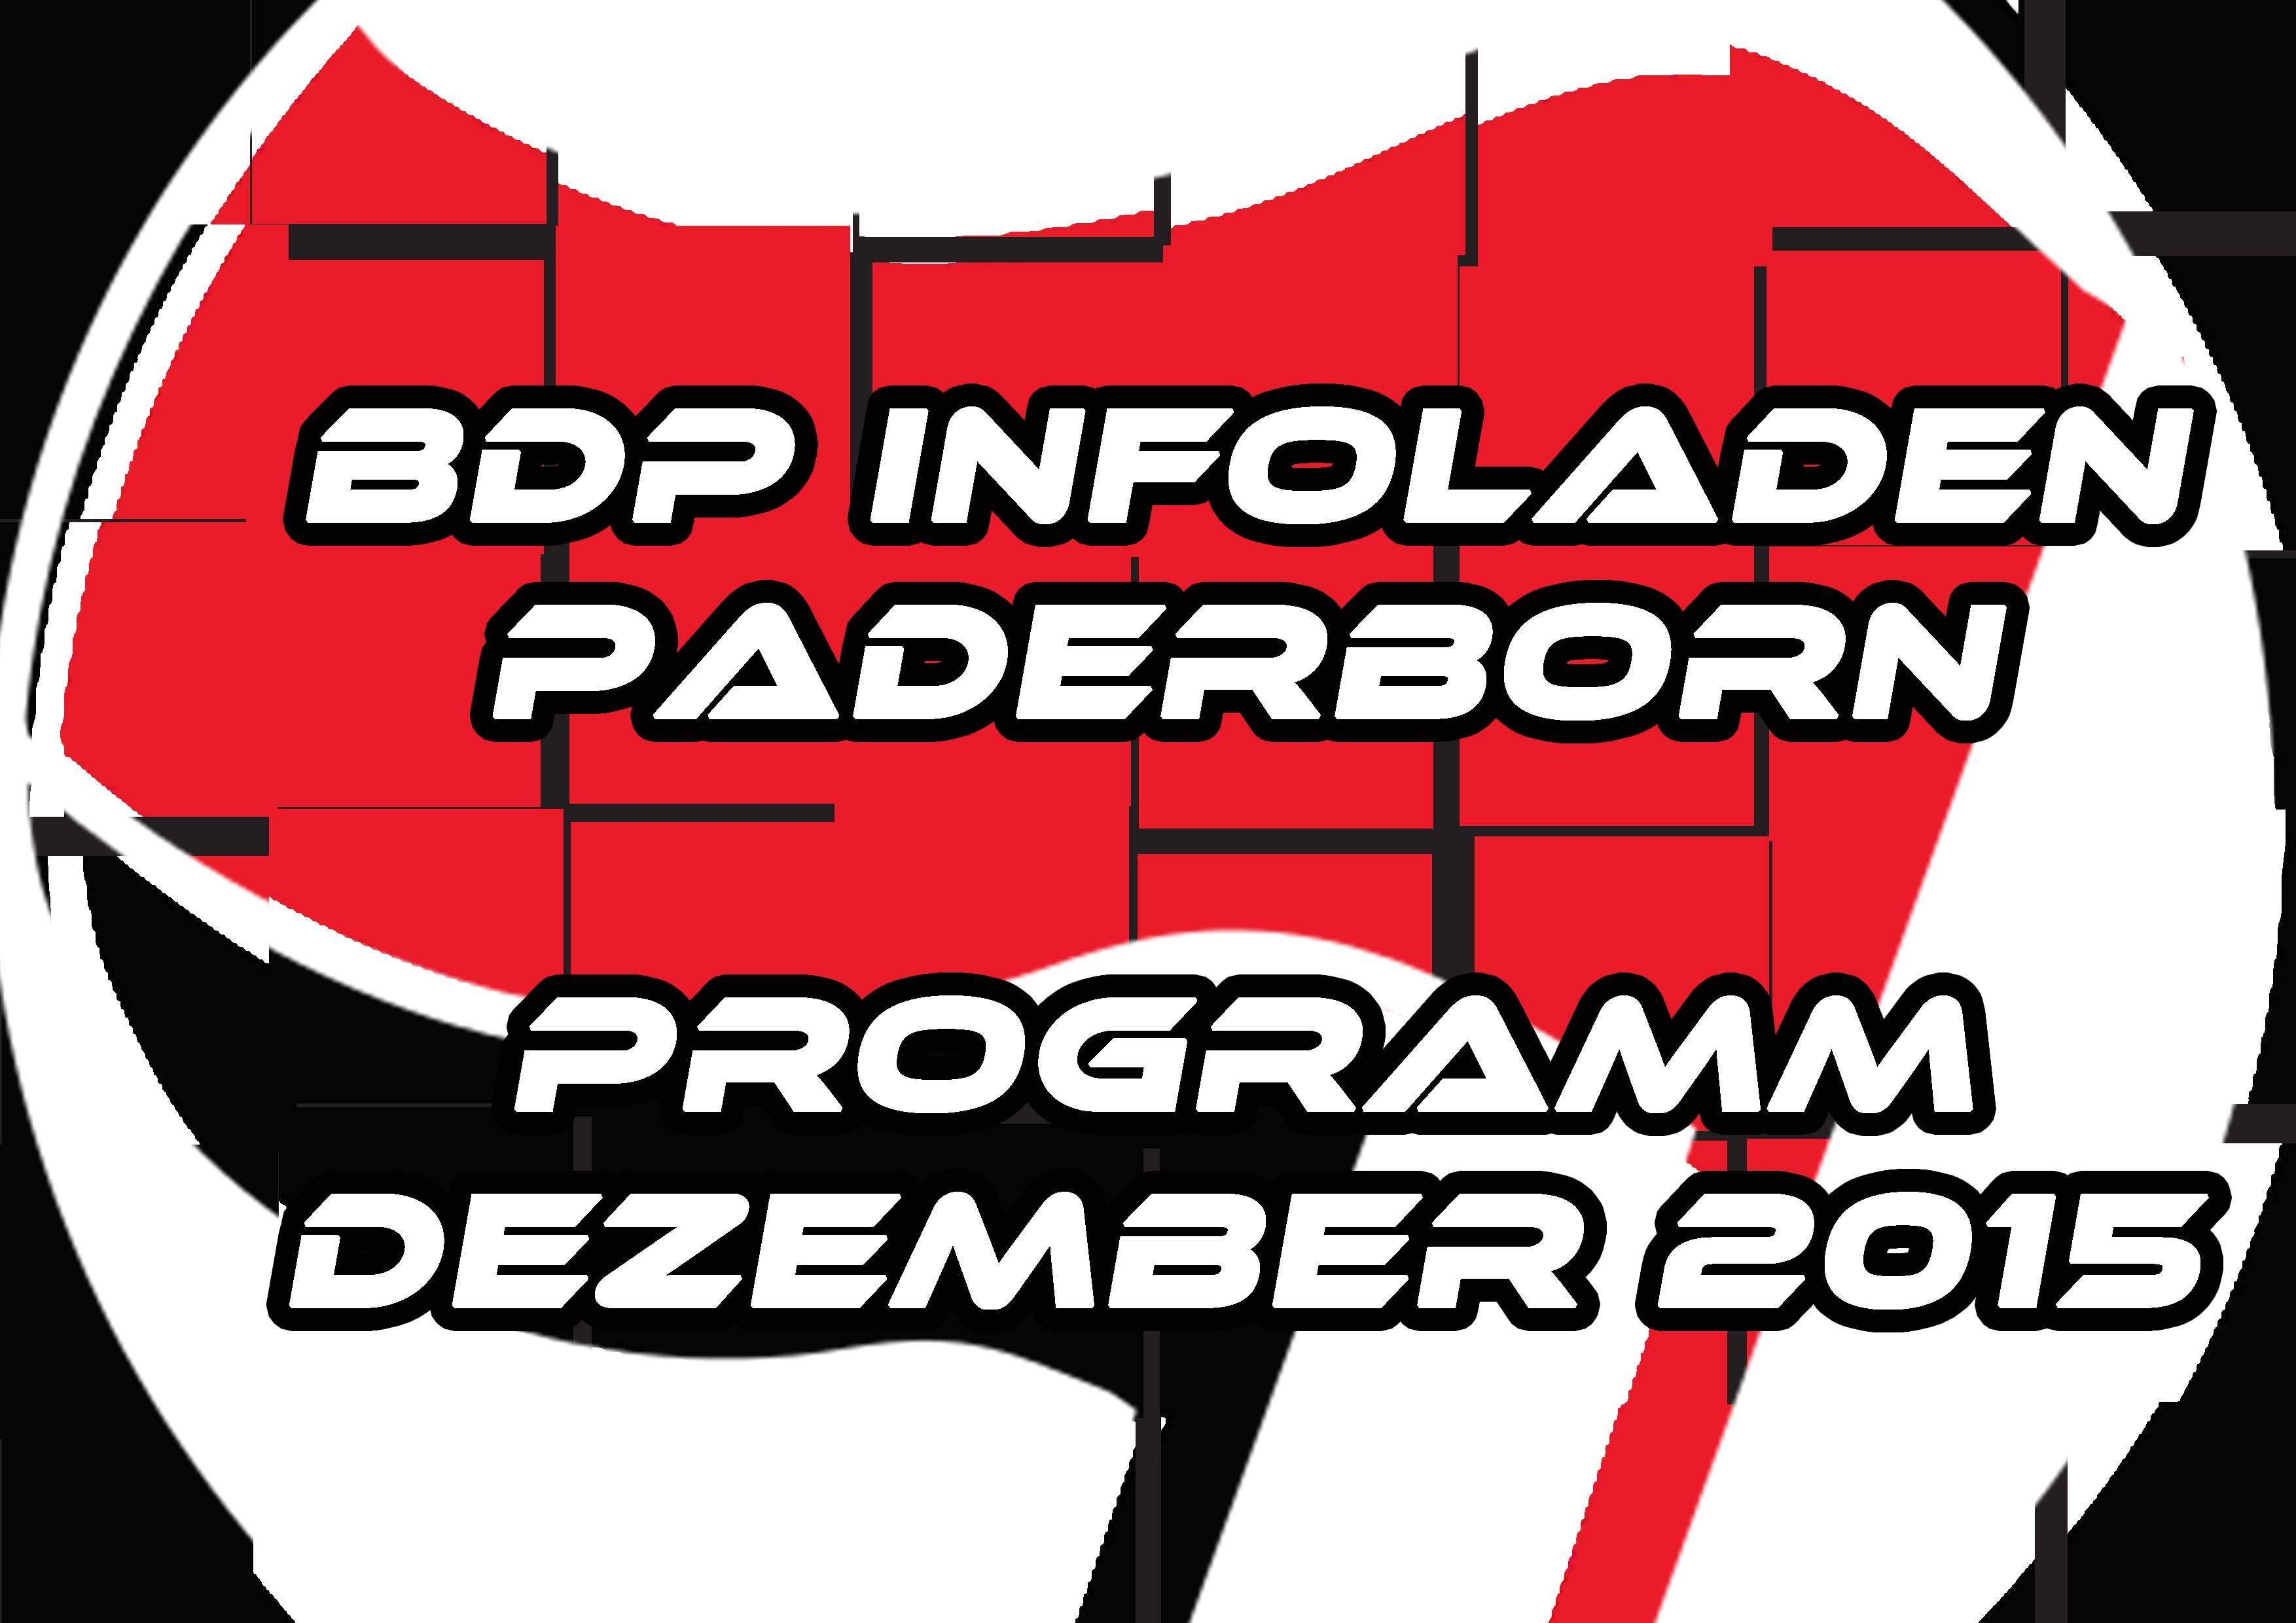 Programm Dezember 2015